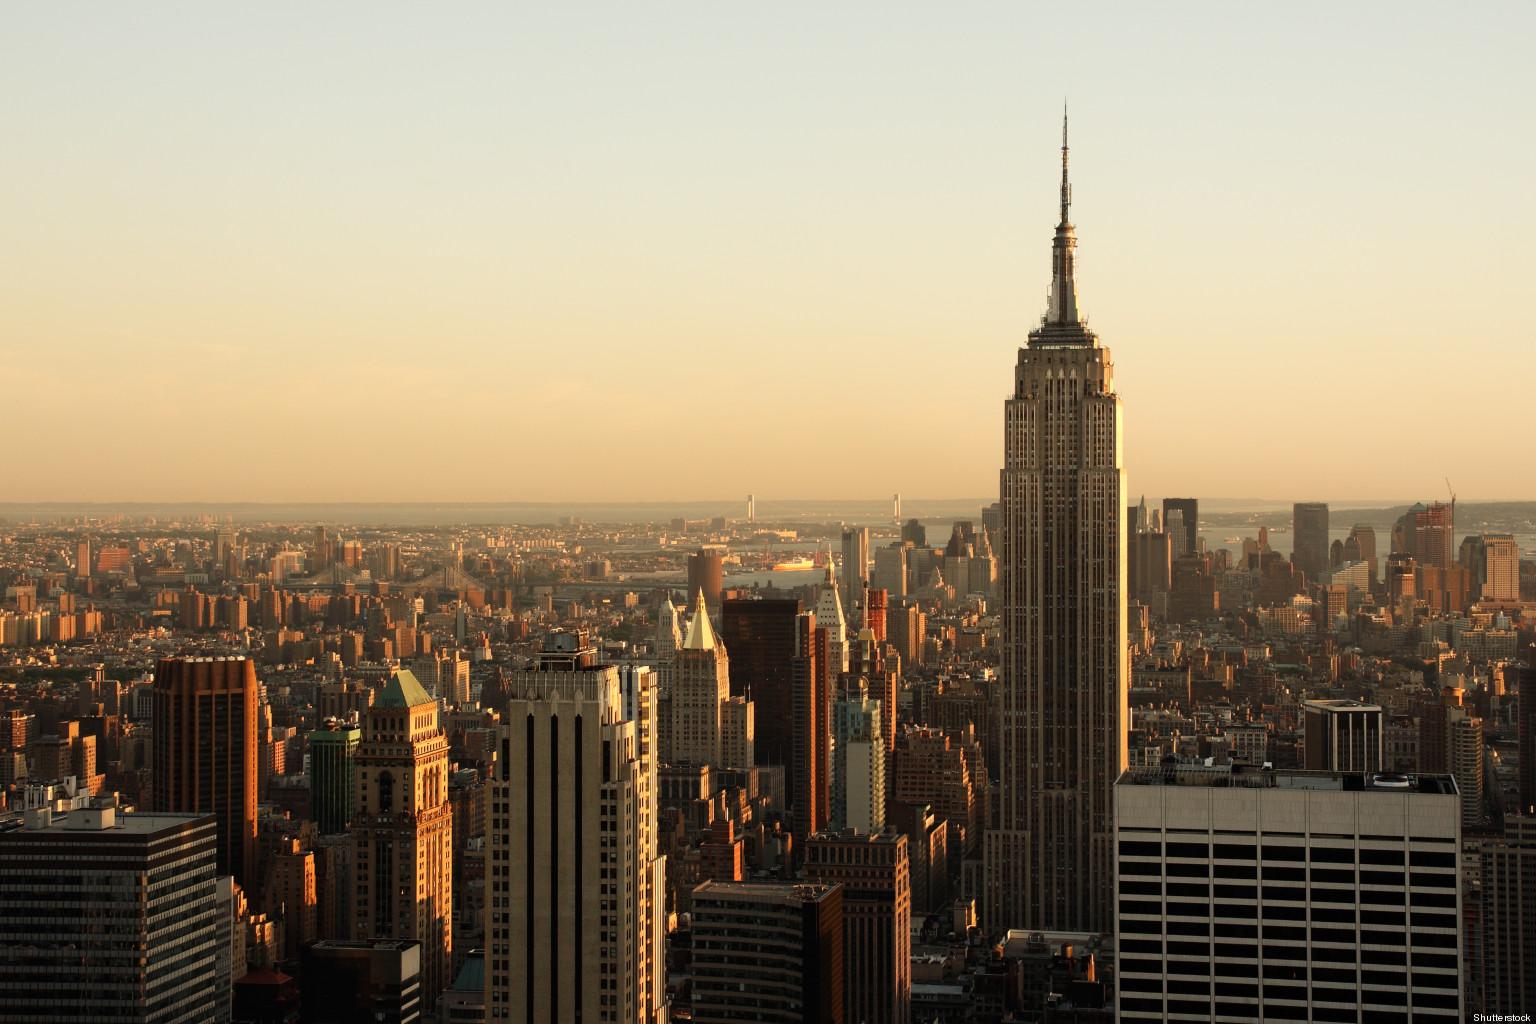 Empire State Building Quote: L'Empire State Building Mis En Bourse